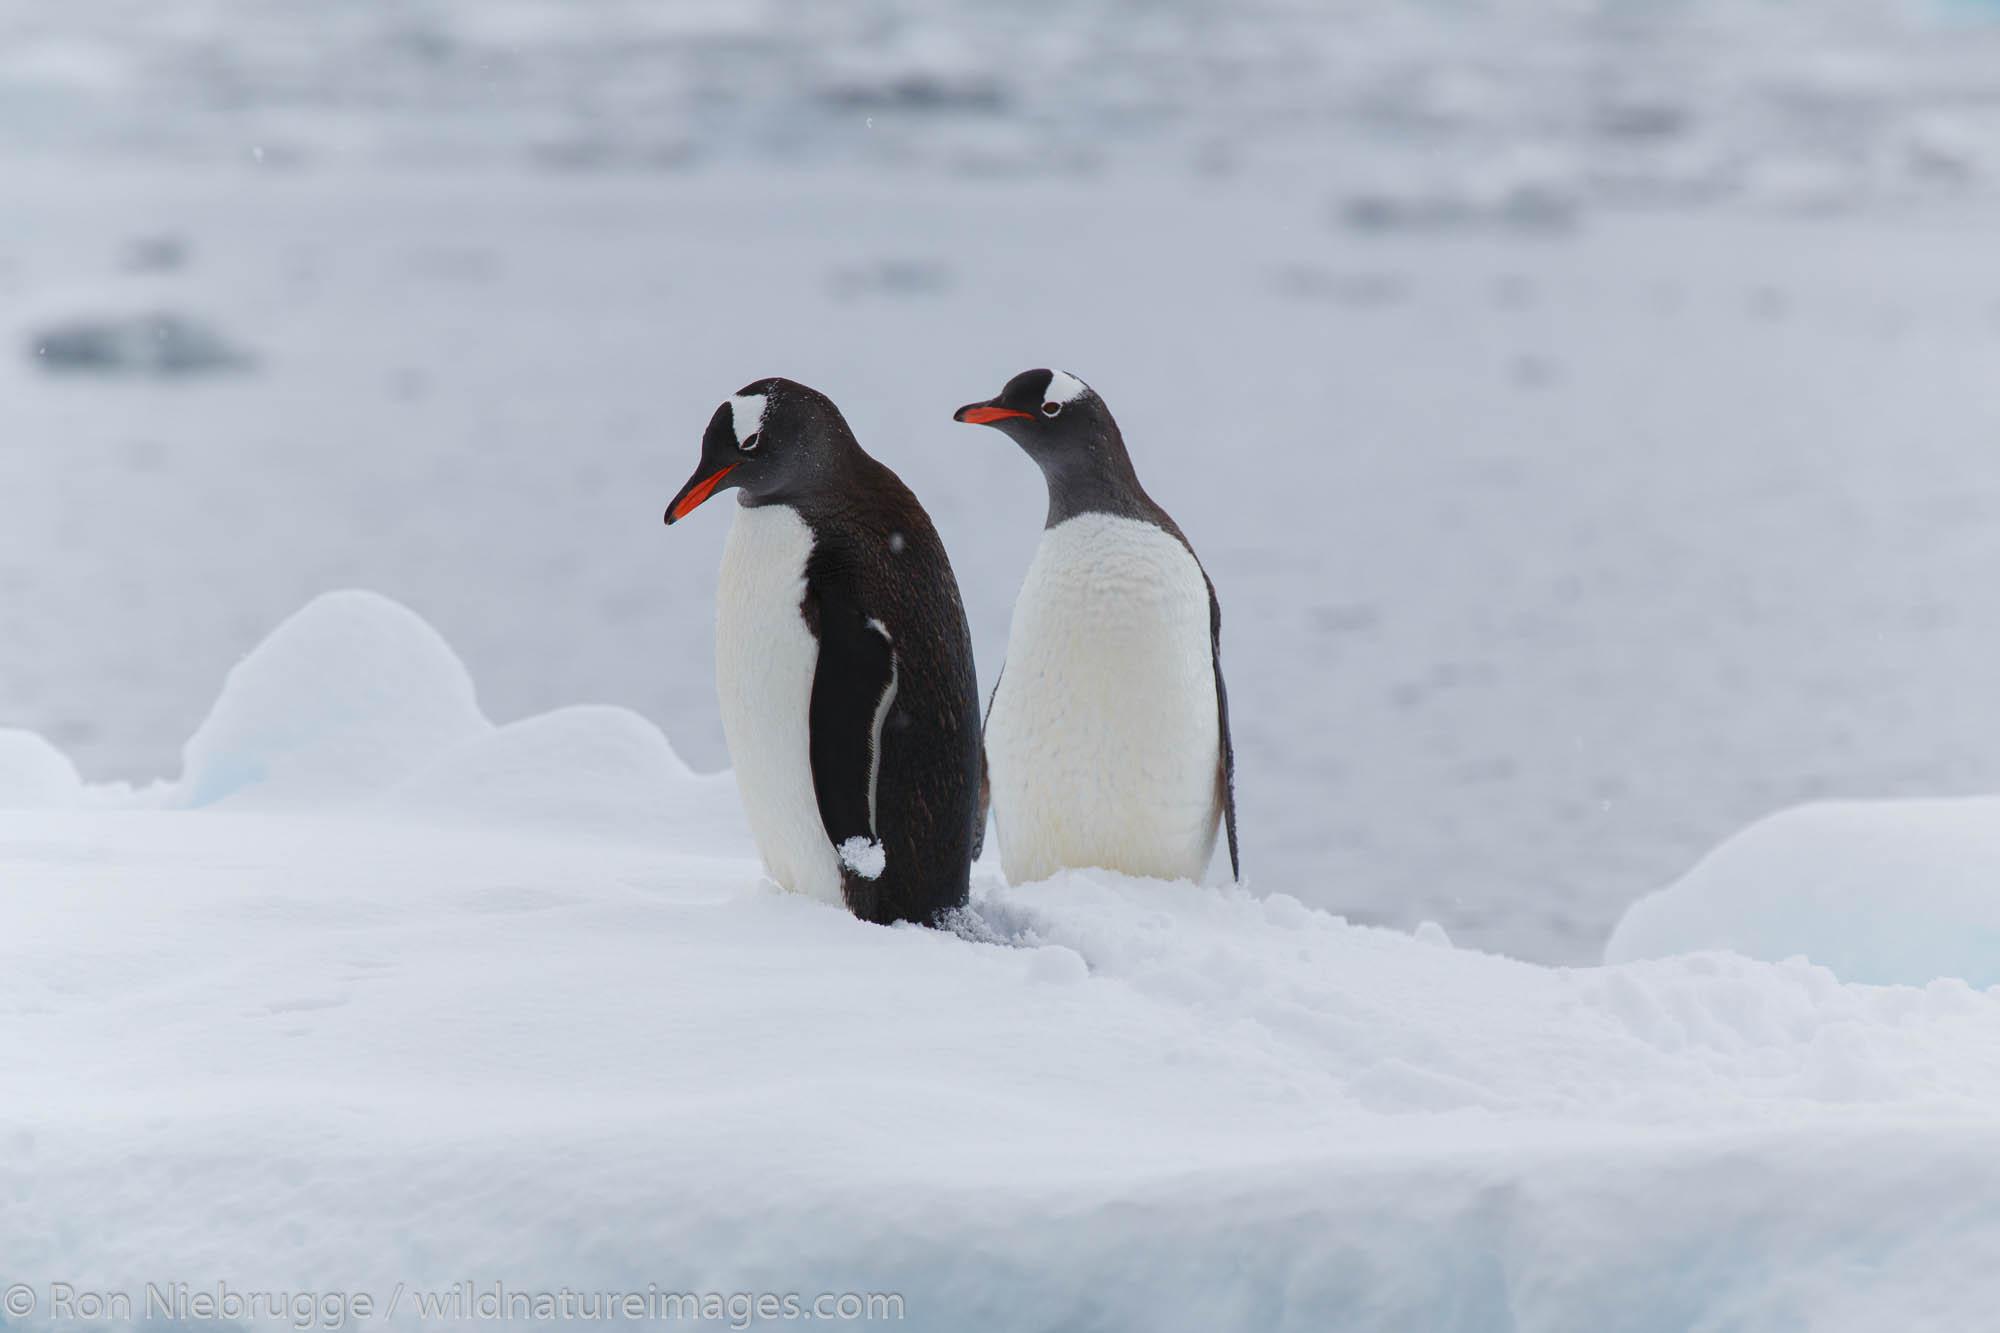 Gentoo penguins (Pygoscelis papua), Cierva Cove, Antarctica.